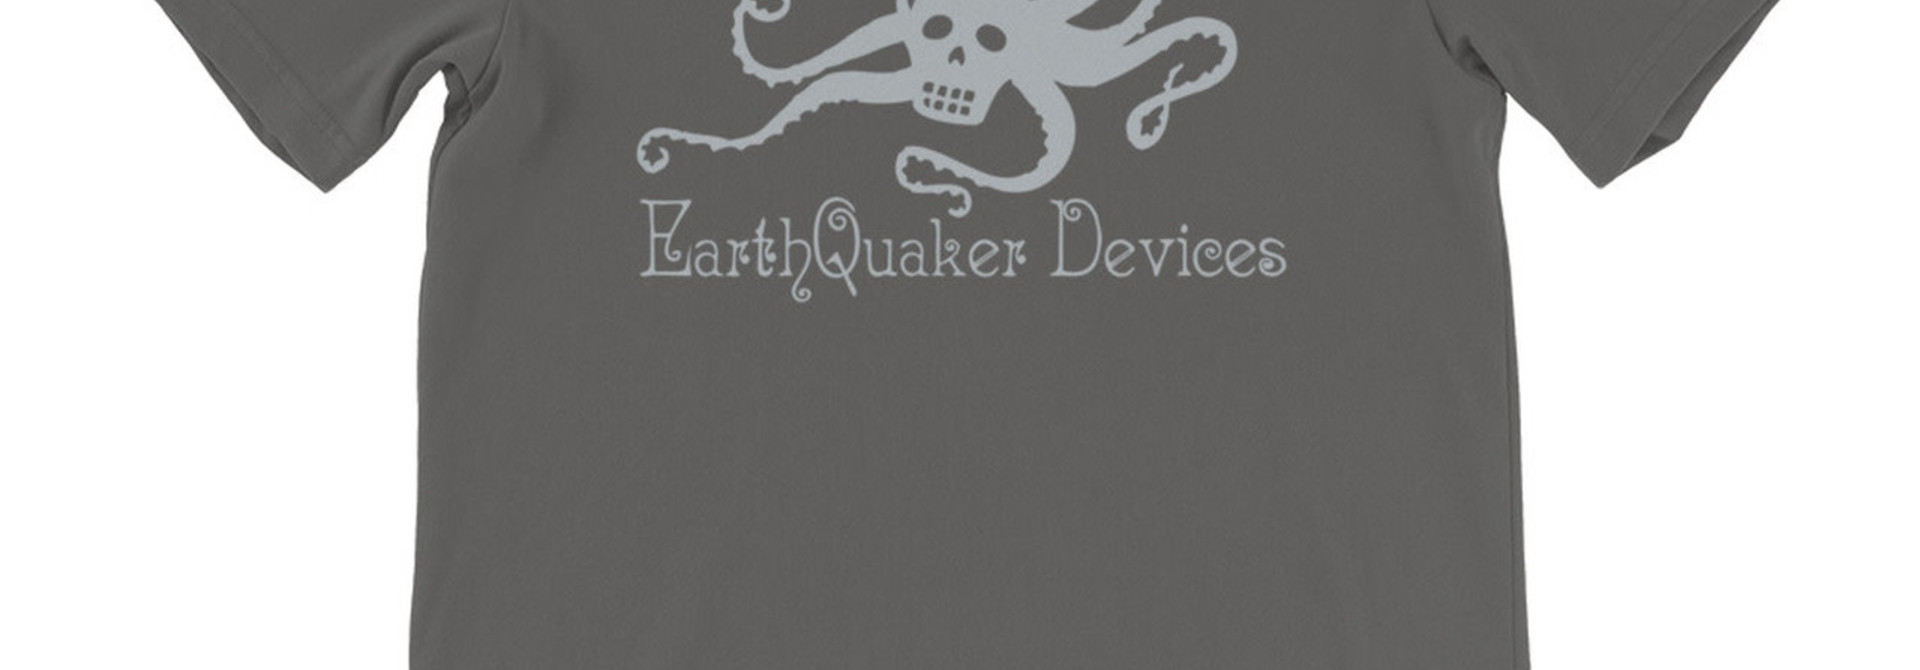 Earthquaker Devices Octoskull Logo T-shirt